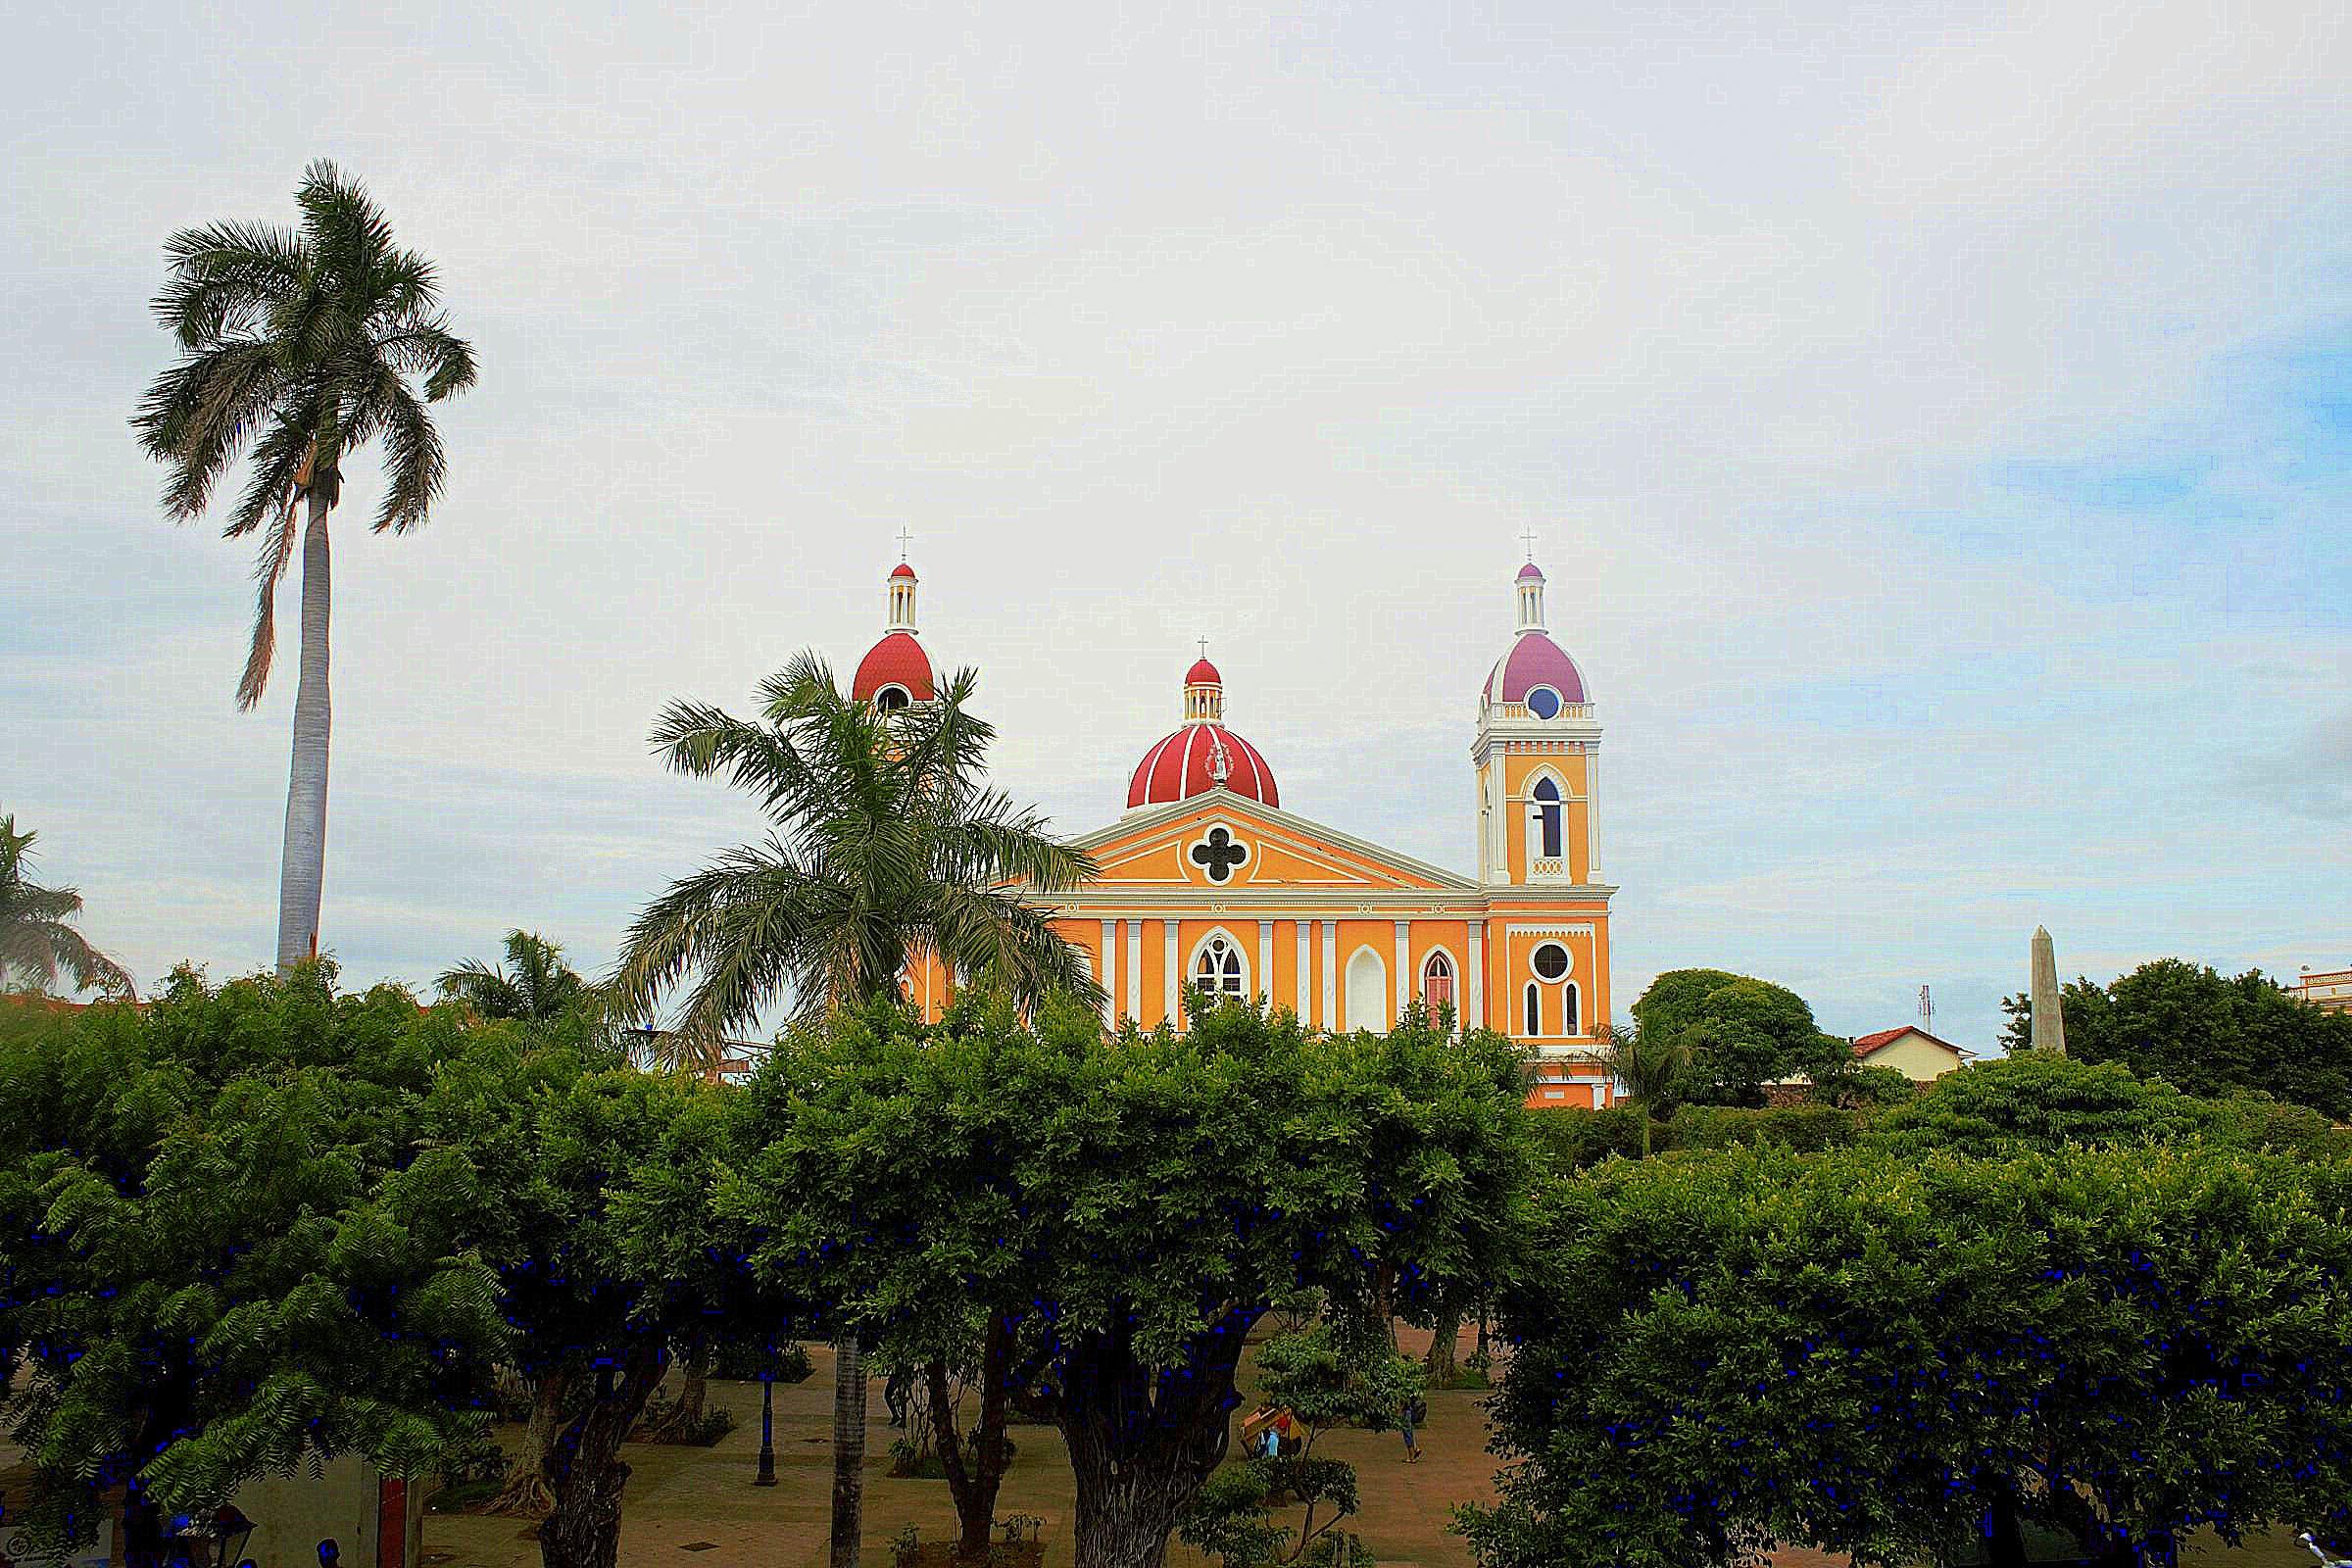 https://bubo.sk/uploads/galleries/7338/alenaspisakova_nikaraguagranada8.jpg